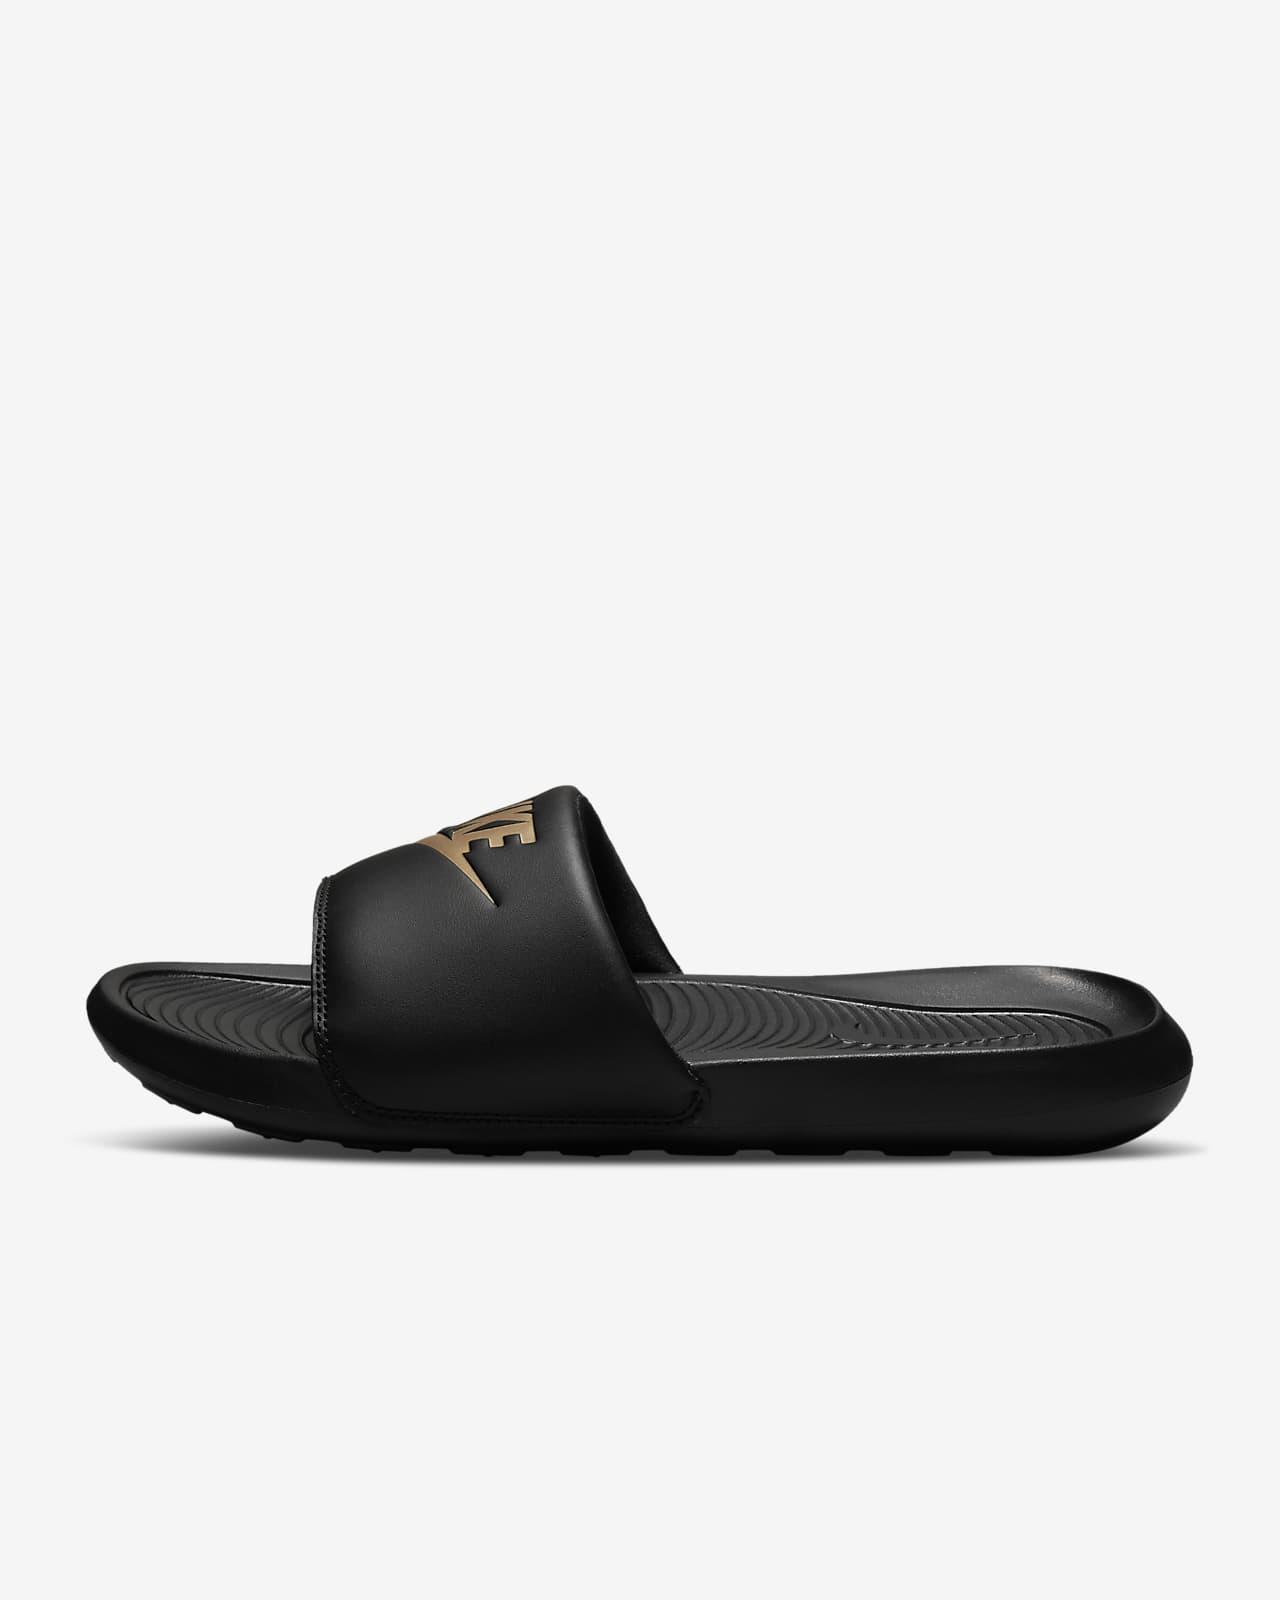 Nike Victori One Men's Slide